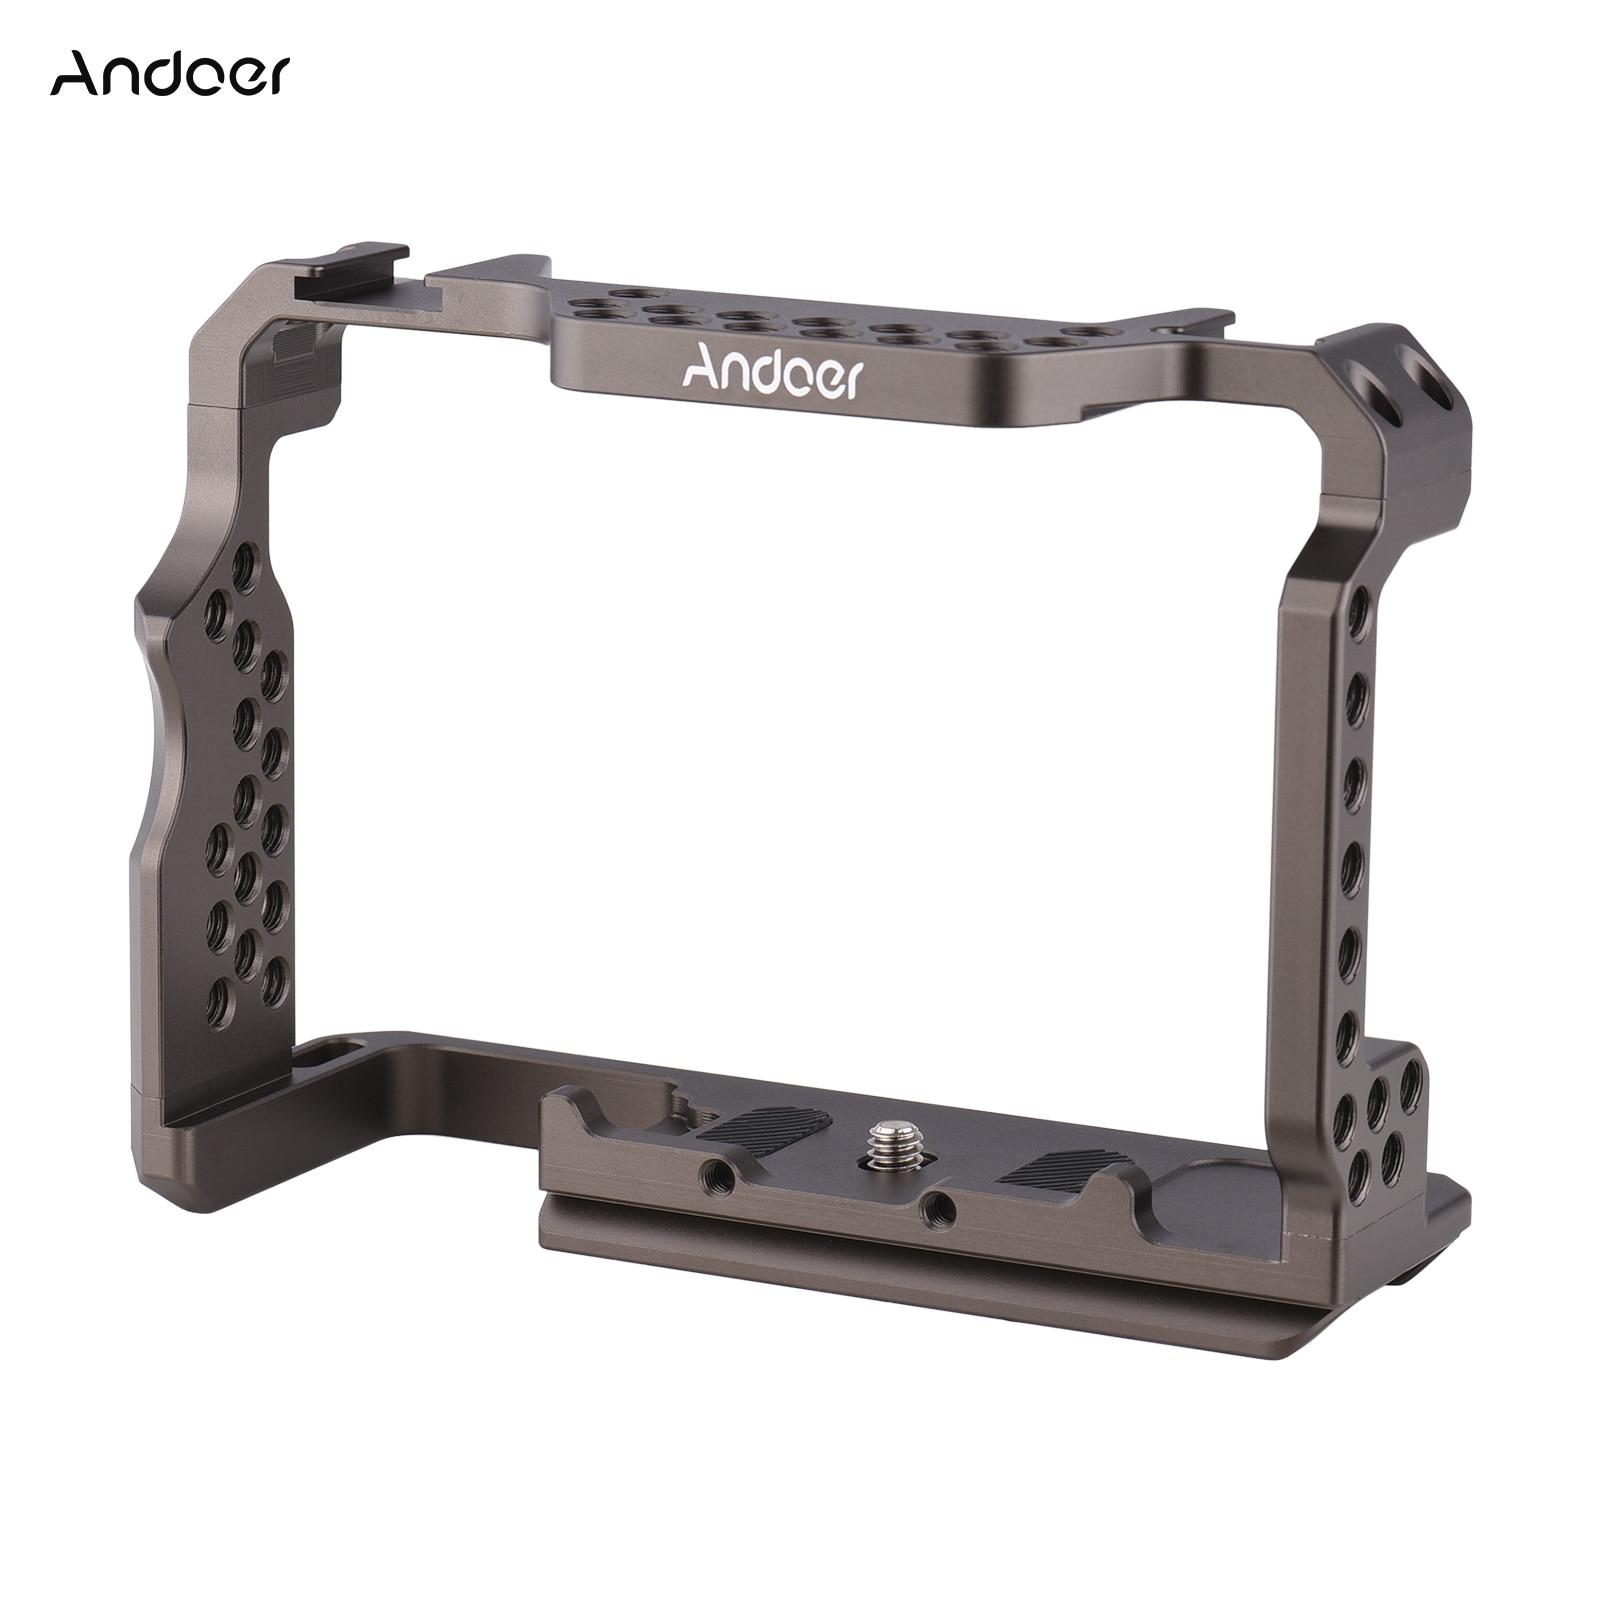 Andoer سبائك الألومنيوم هيكل قفصي الشكل للكاميرا فيديو تلاعب استبدال لسوني A7R III/ A7 II/ A7III هيكل قفصي الشكل للكاميرا